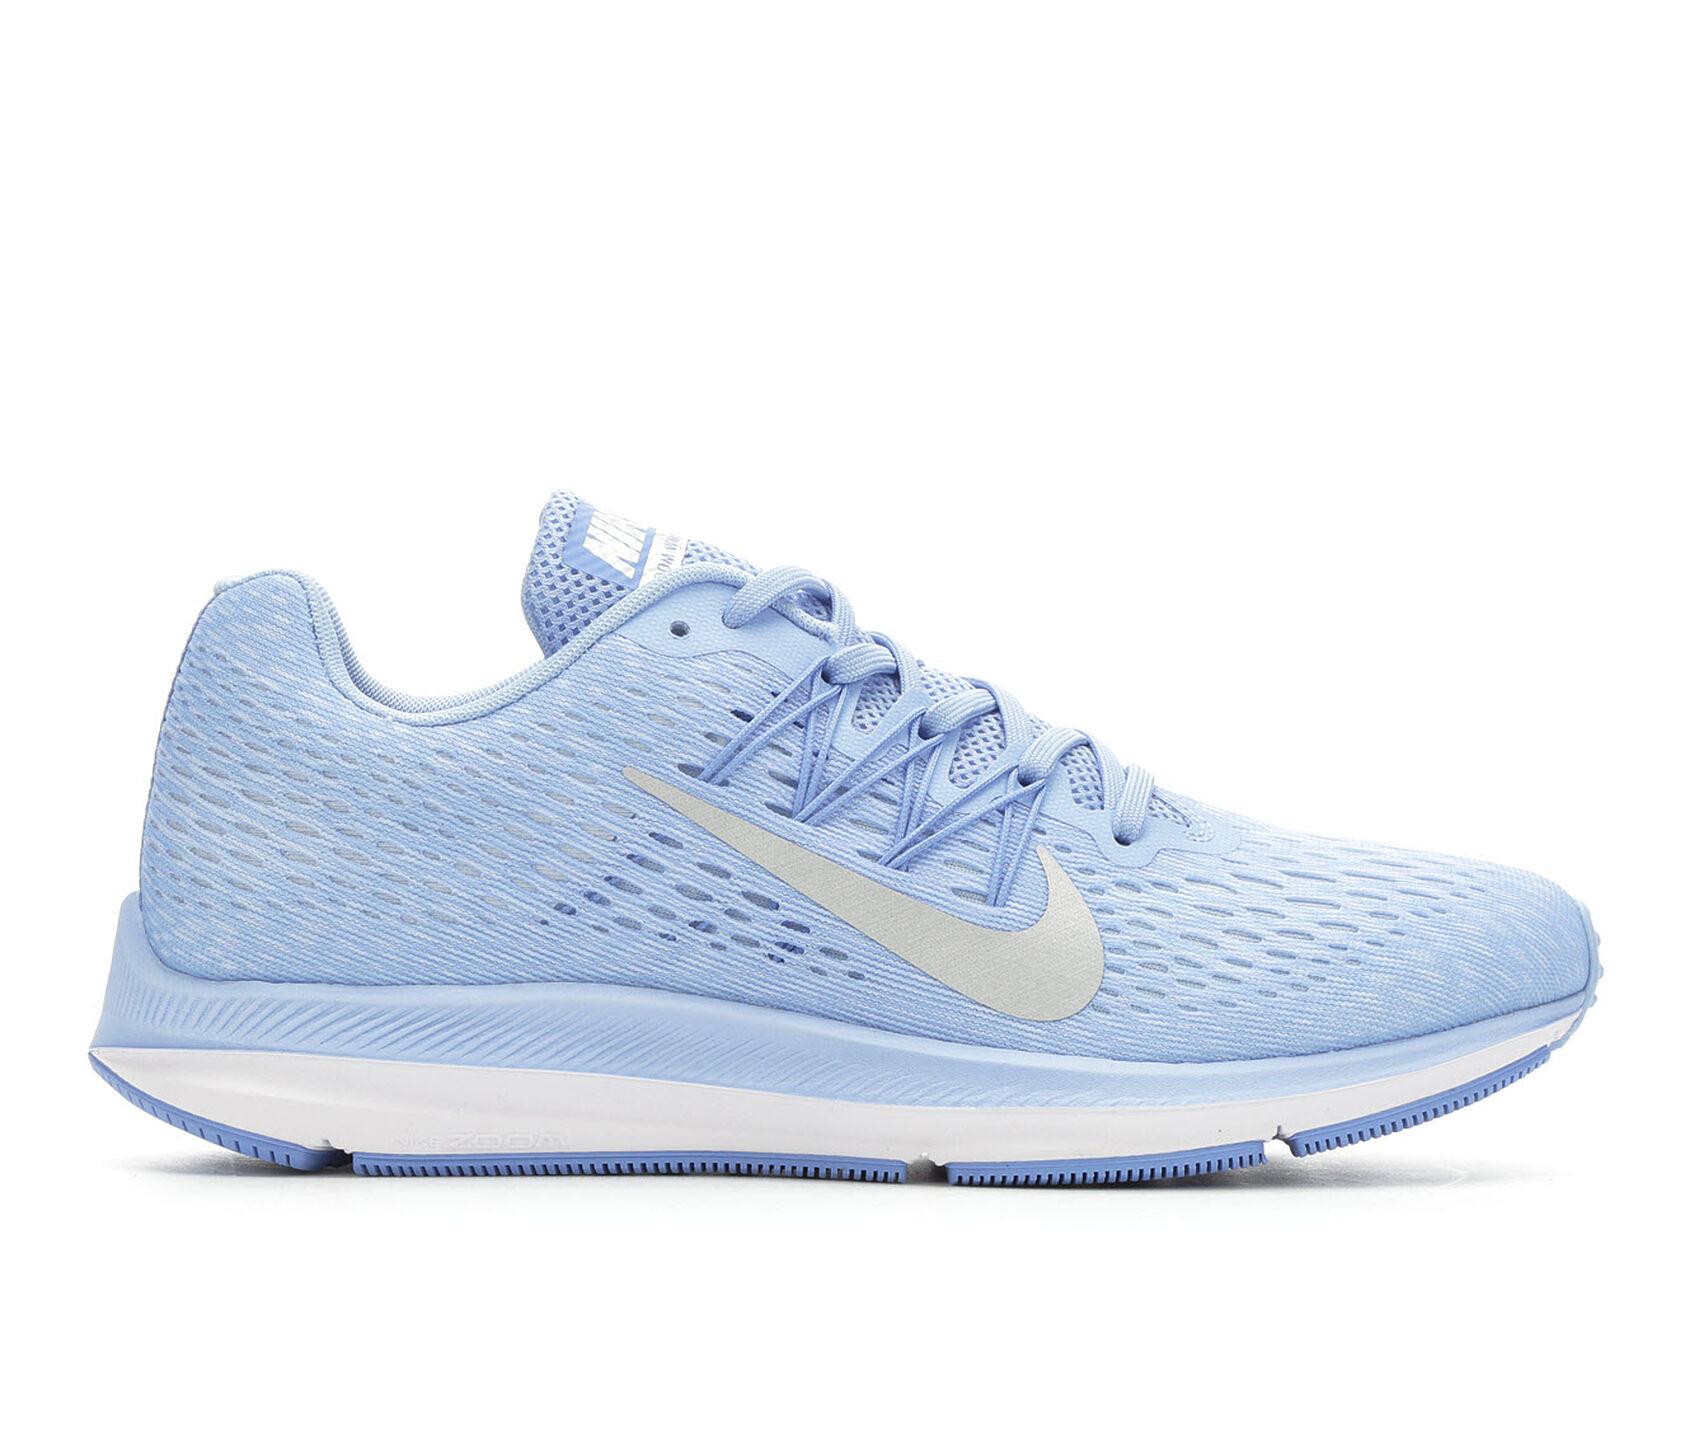 ac46da015f15 ... Nike Zoom Winflo 5 Running Shoes. Previous